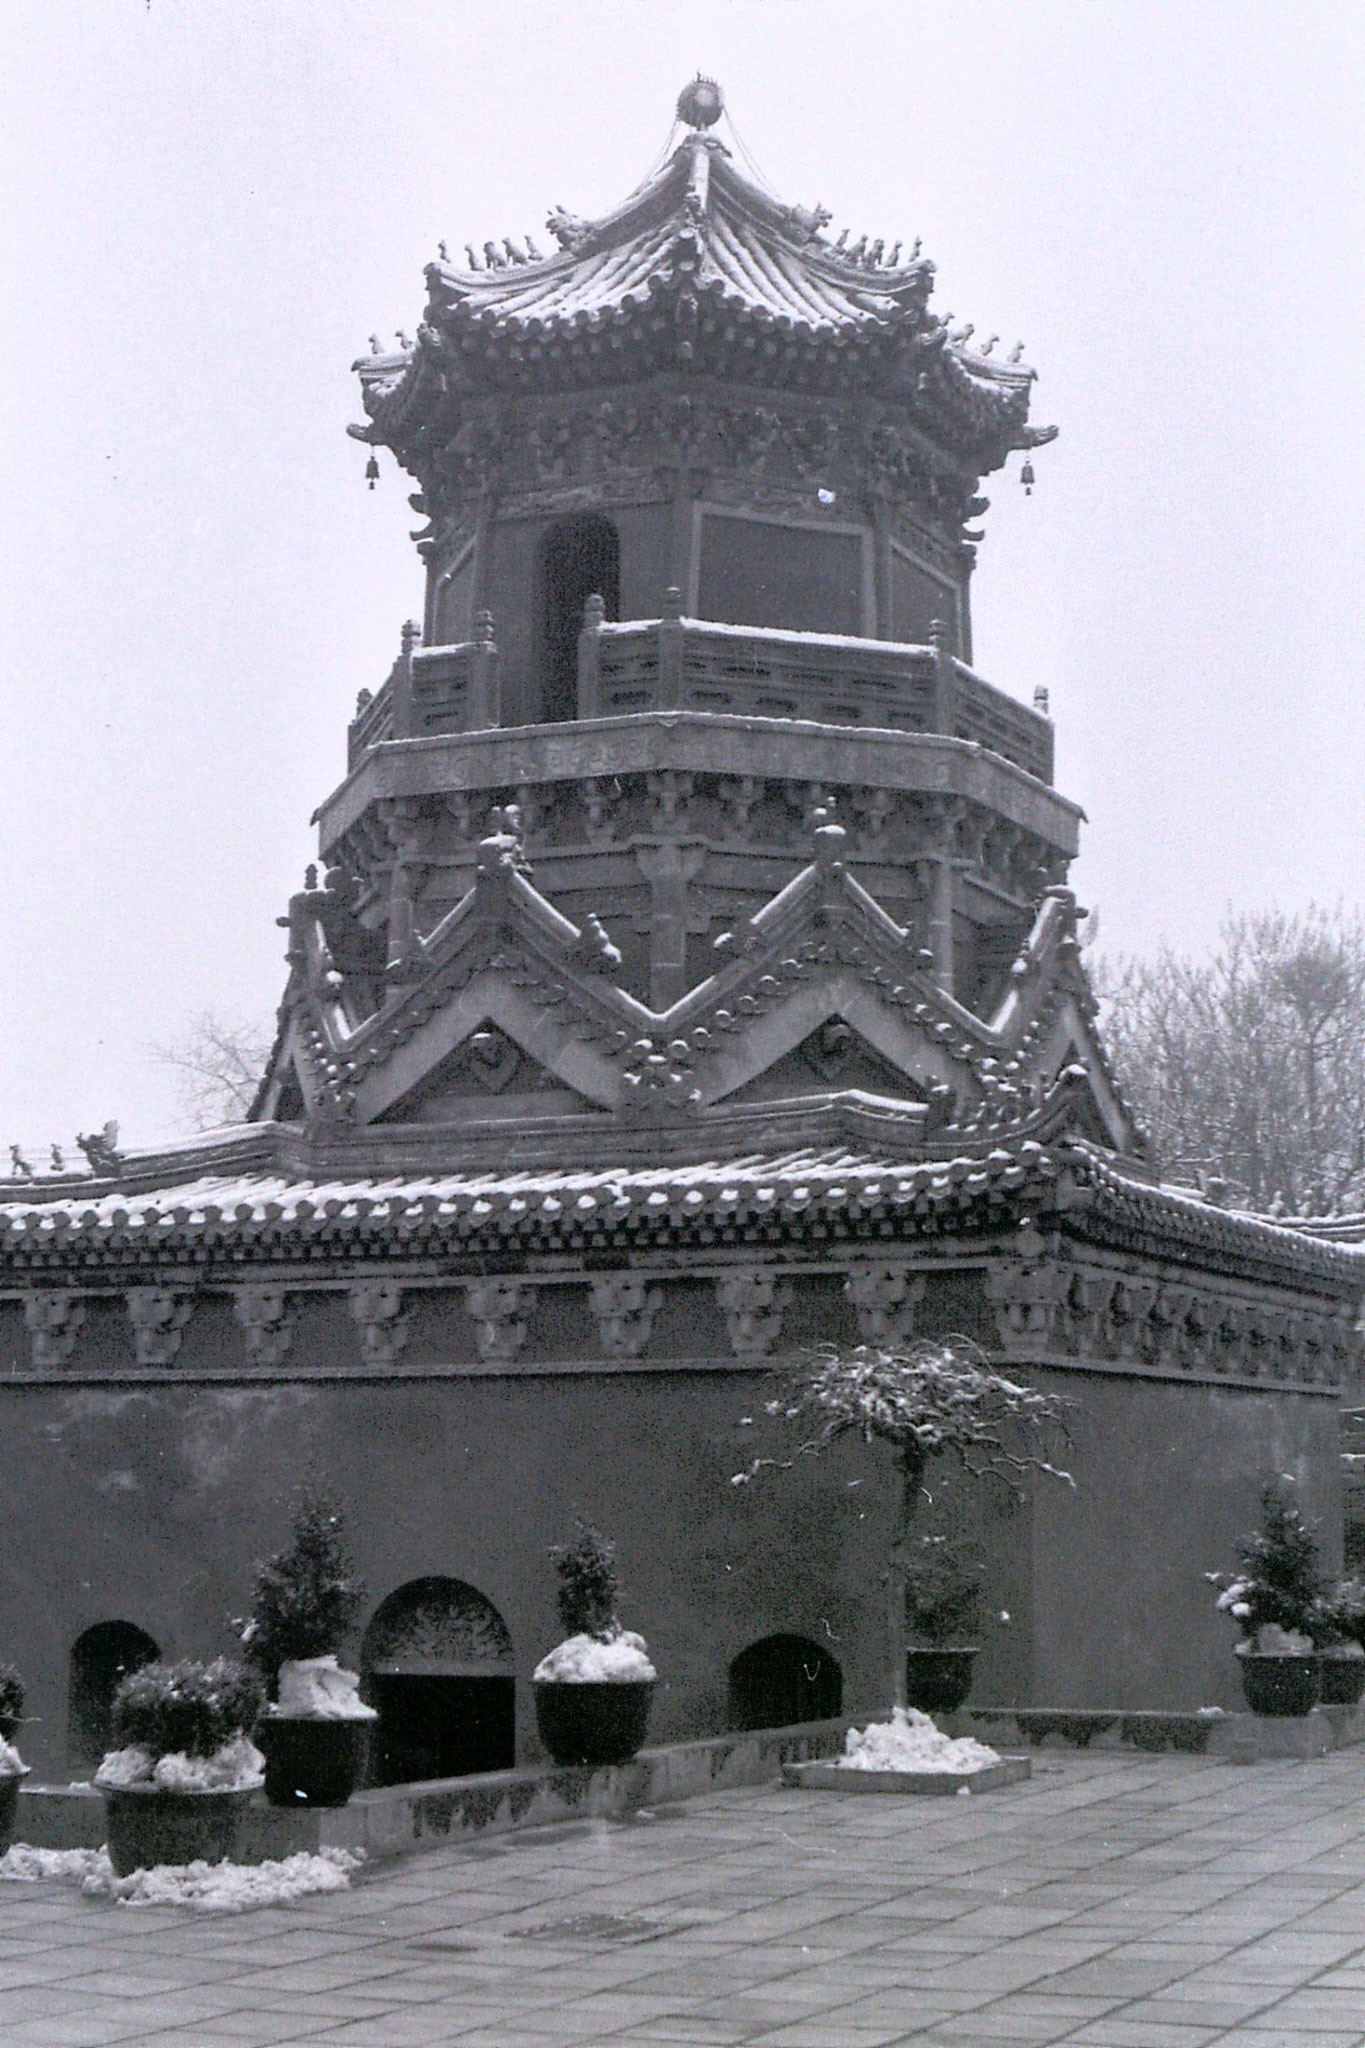 25/2/1989: 30: Tao temple Kaifeng